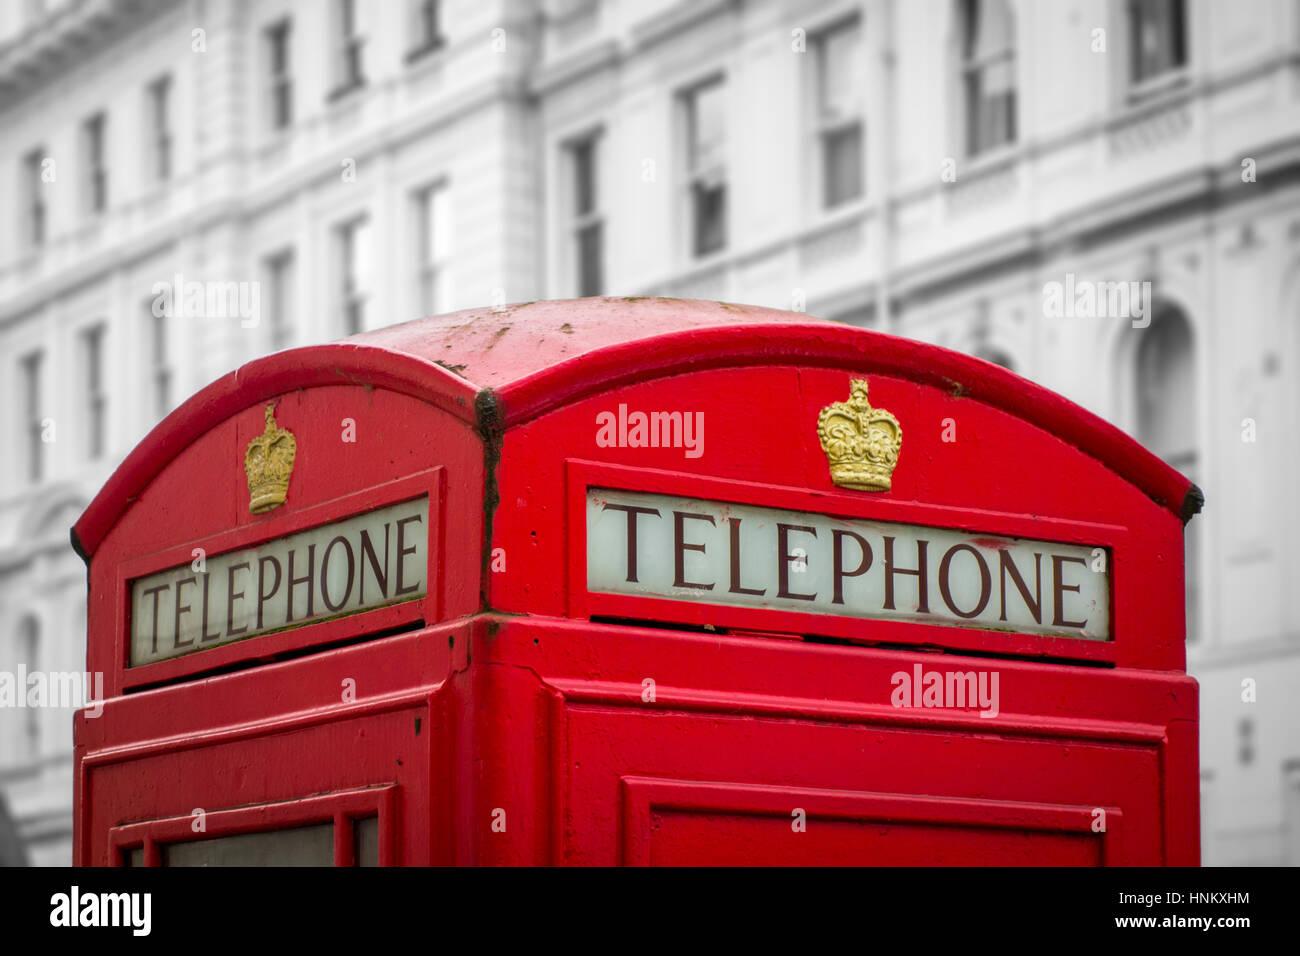 Britische rote Telefonzelle, London, UK Stockbild